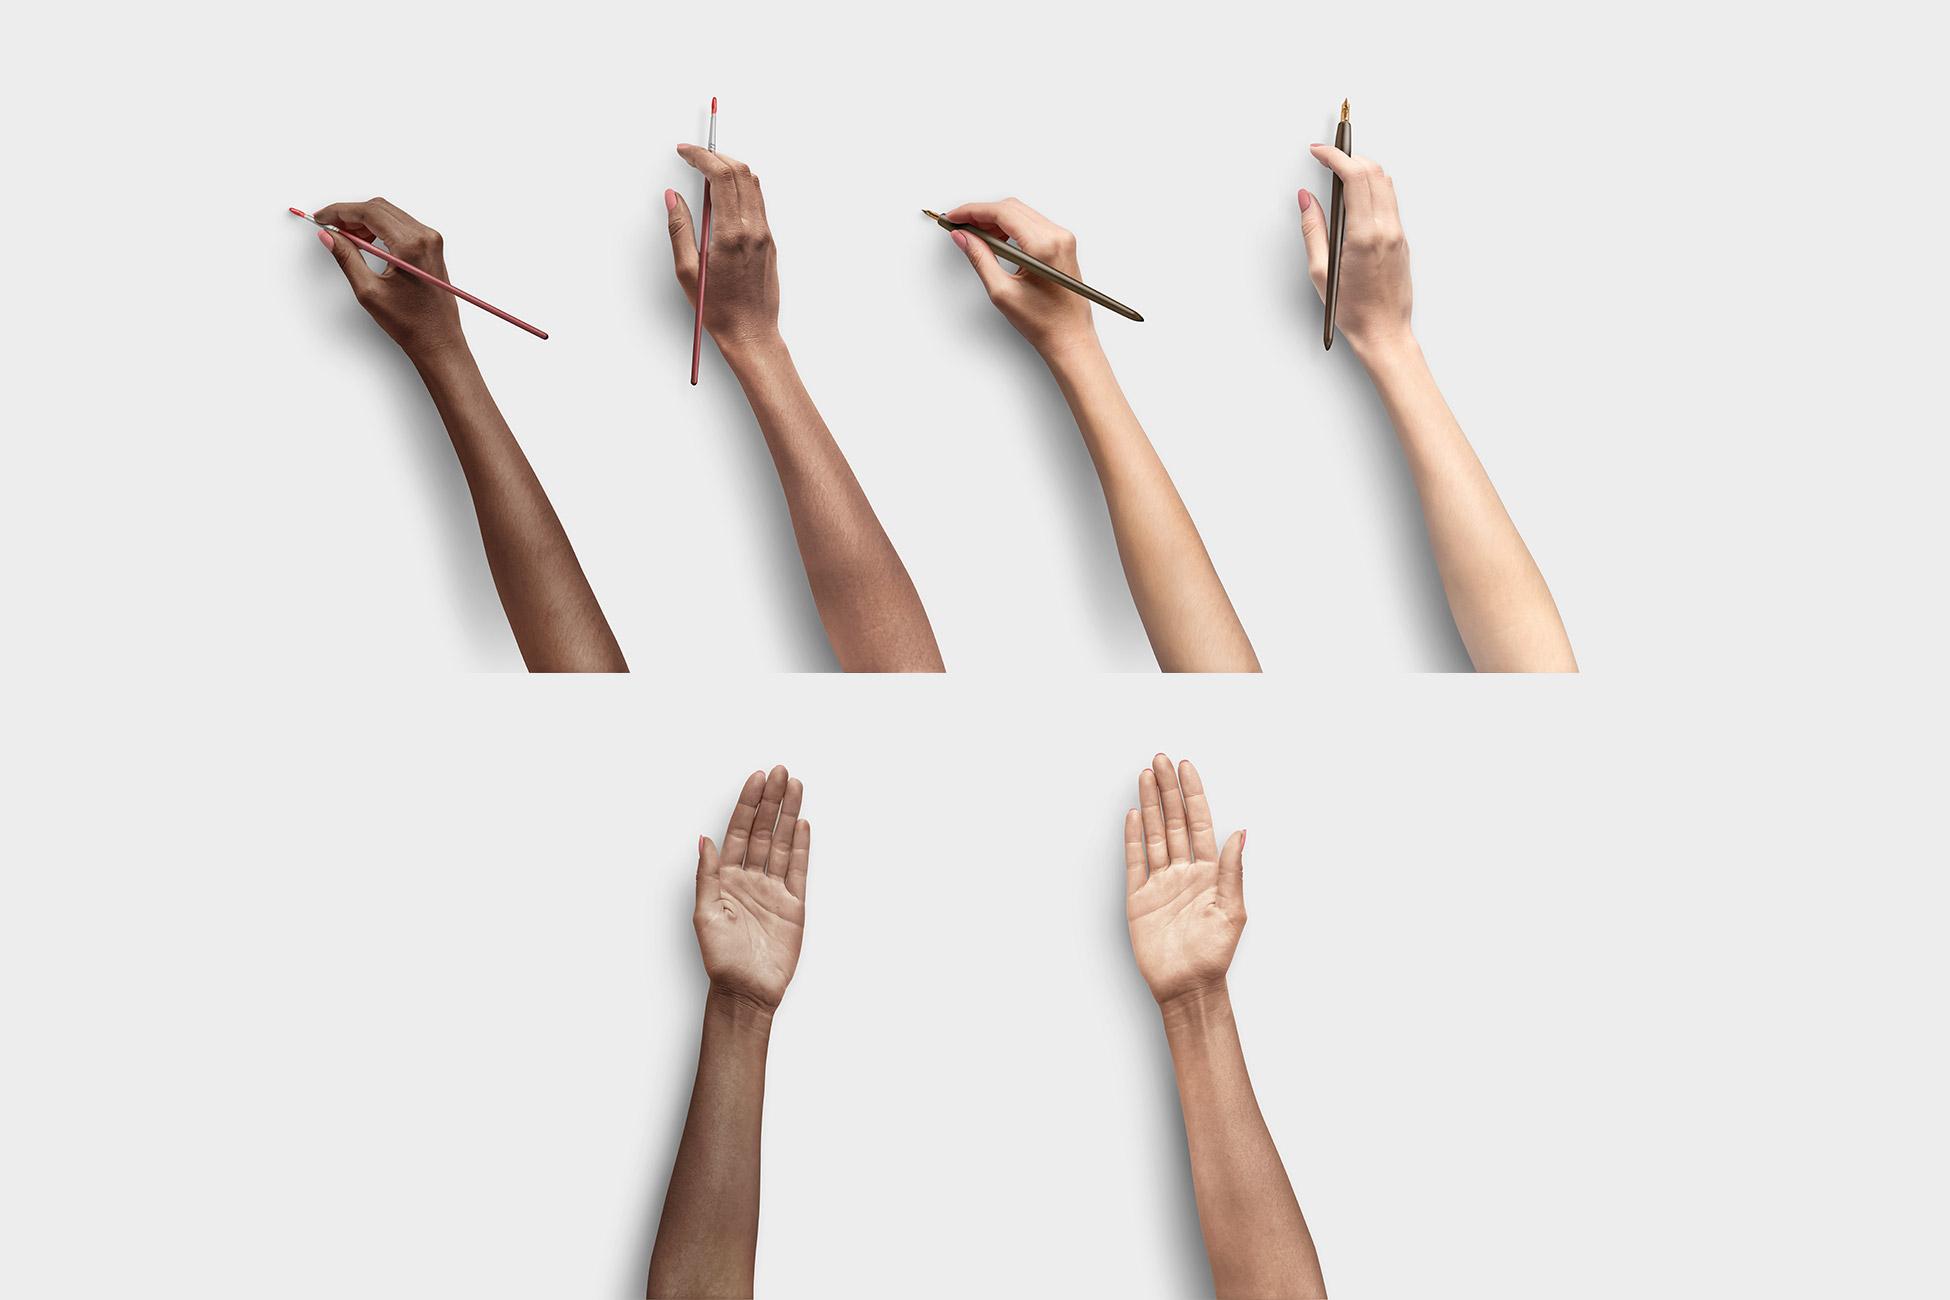 Hands Item Scene Creator